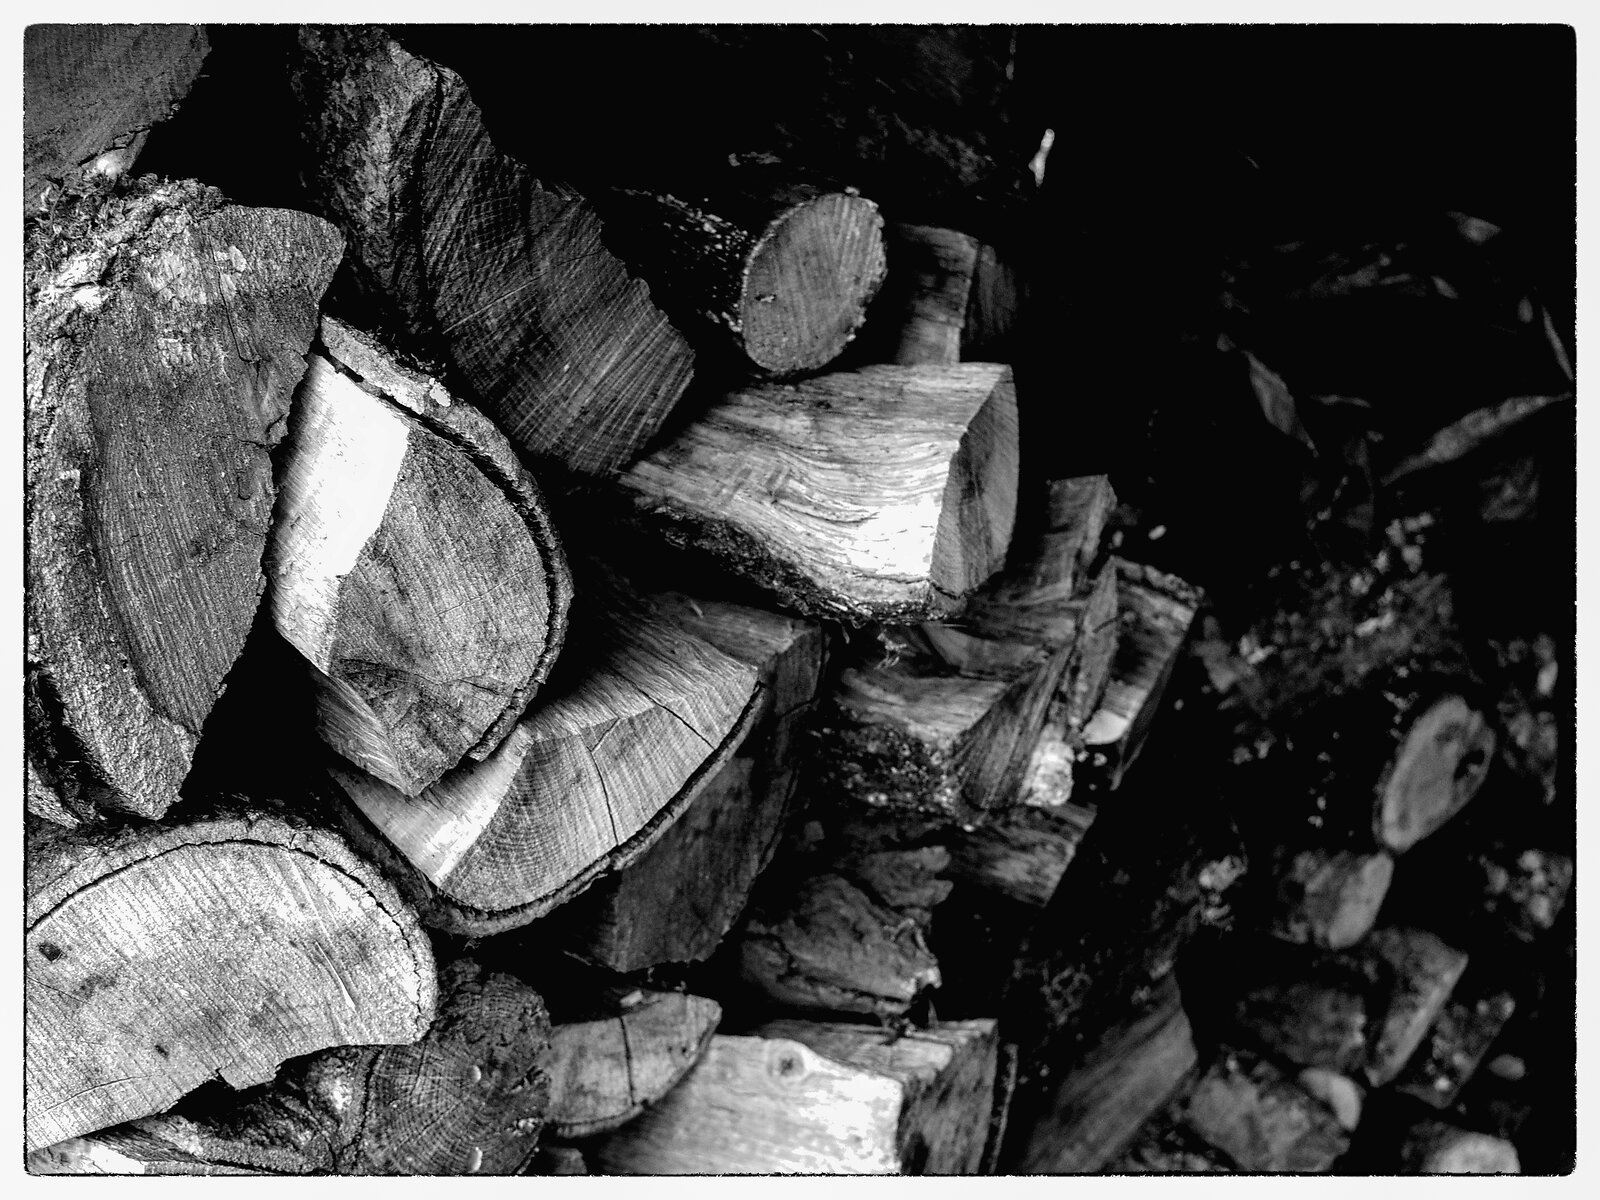 Q7_Mar9_21_wood_shed#2.jpg